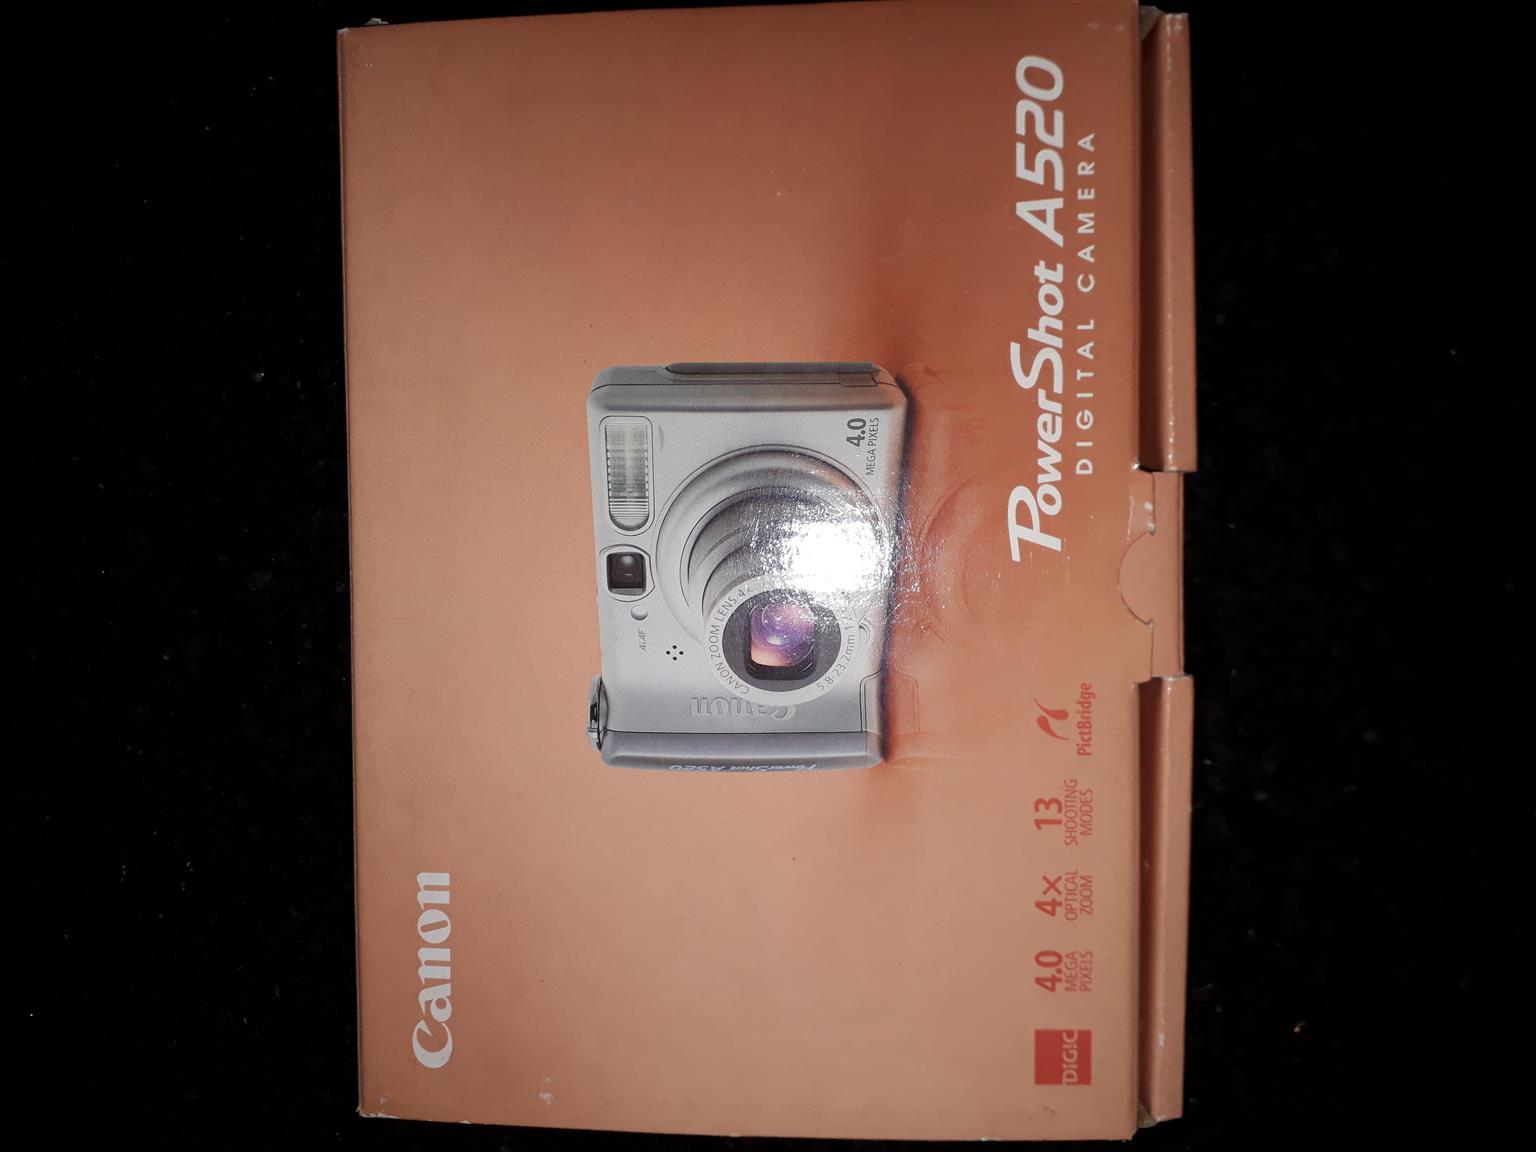 Cannon A520 powershot camera